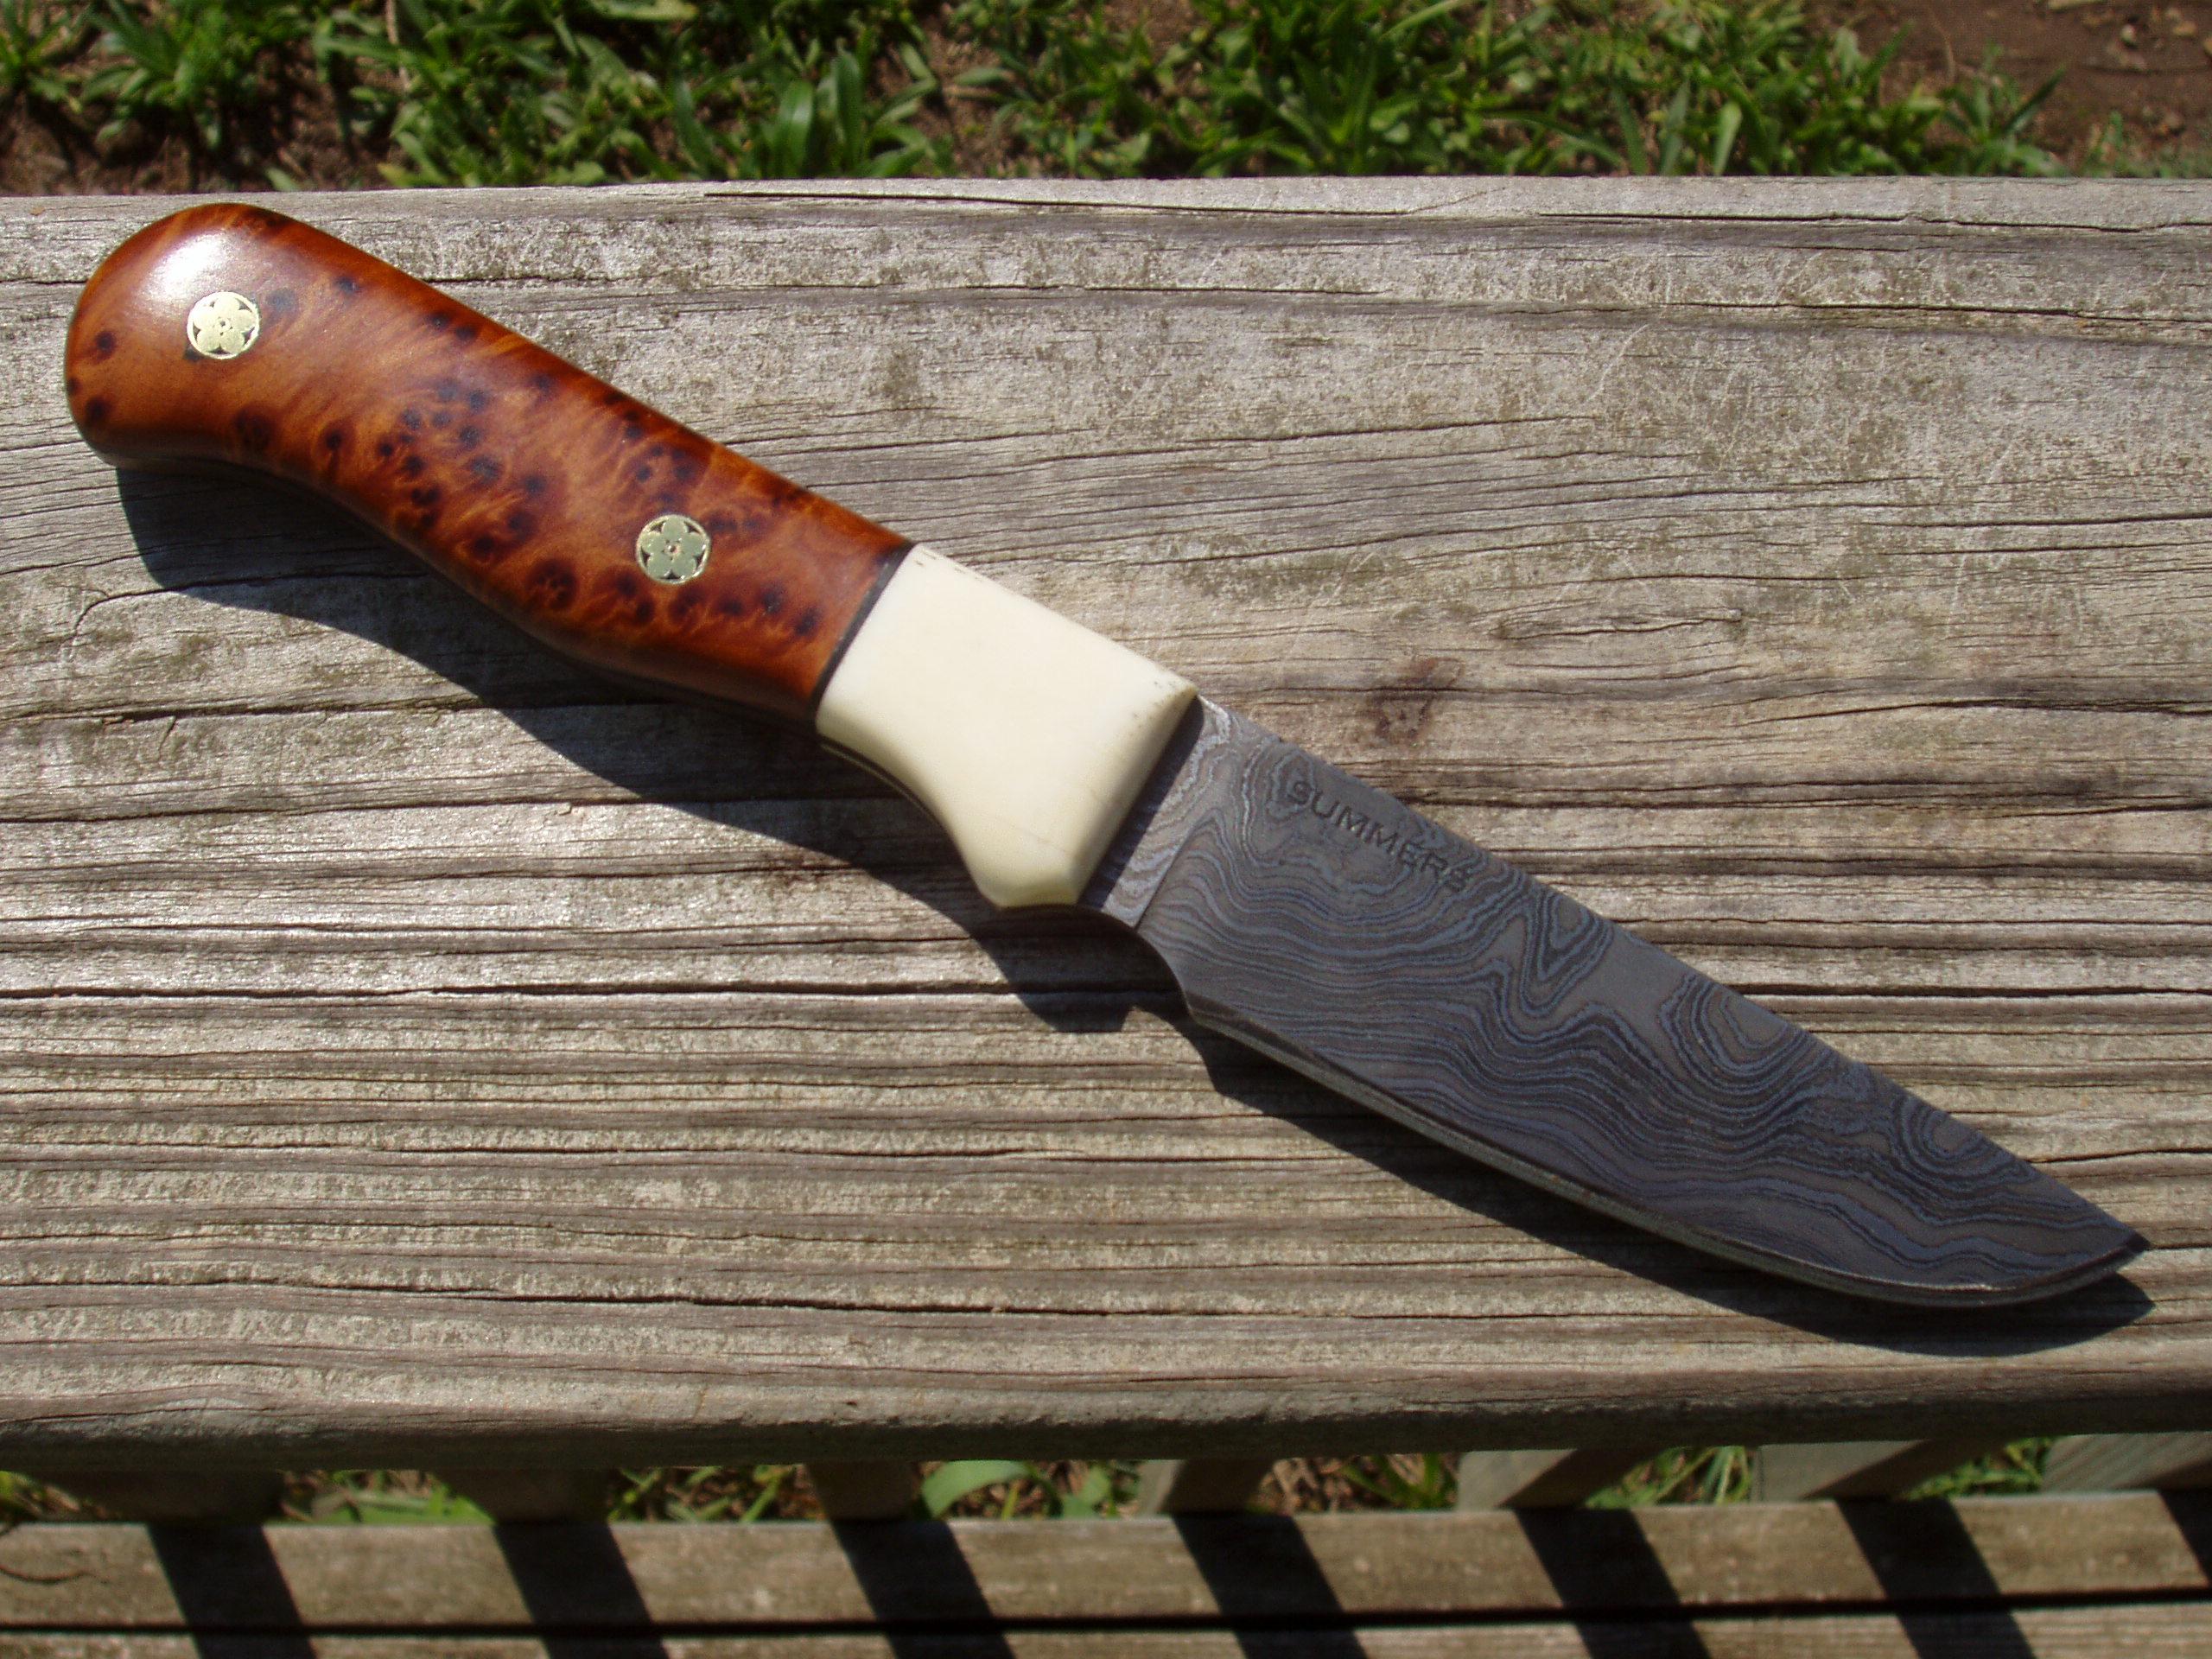 Independence Project- Knifemaker